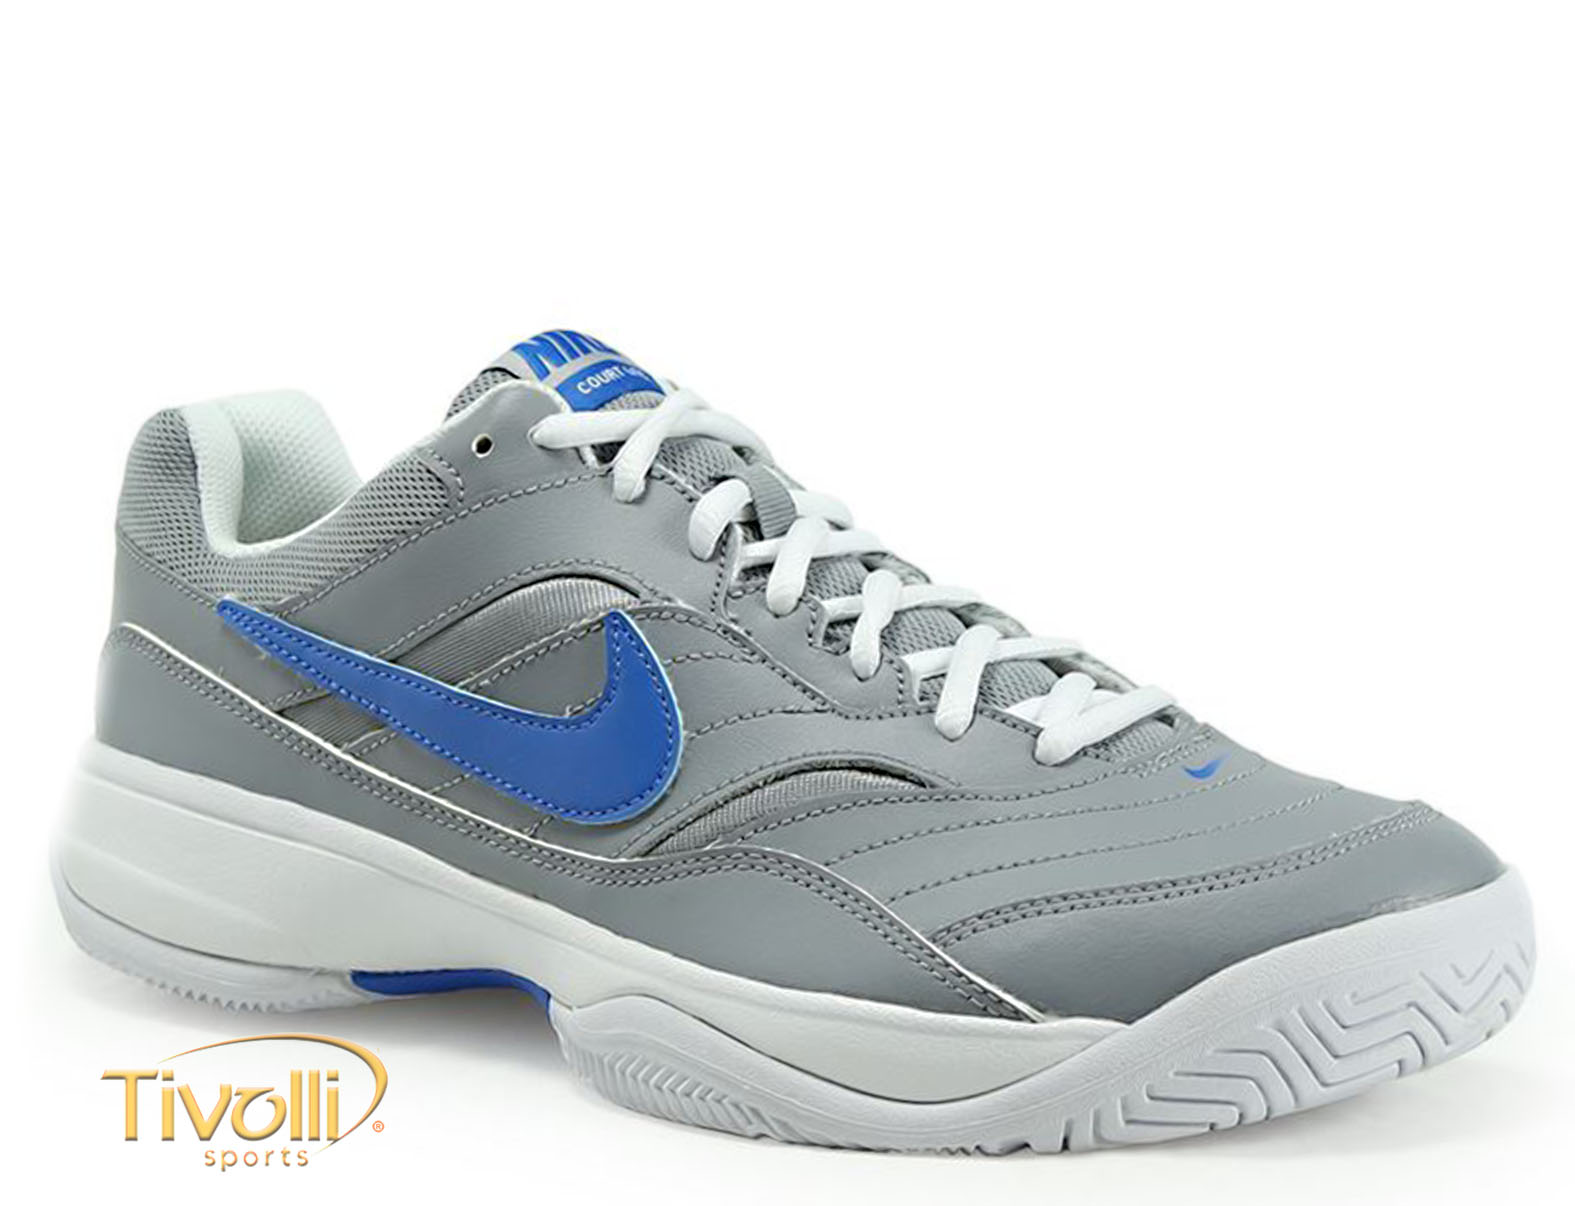 ca04868f75 Raquete Mania   Tênis Nike   Court Lite